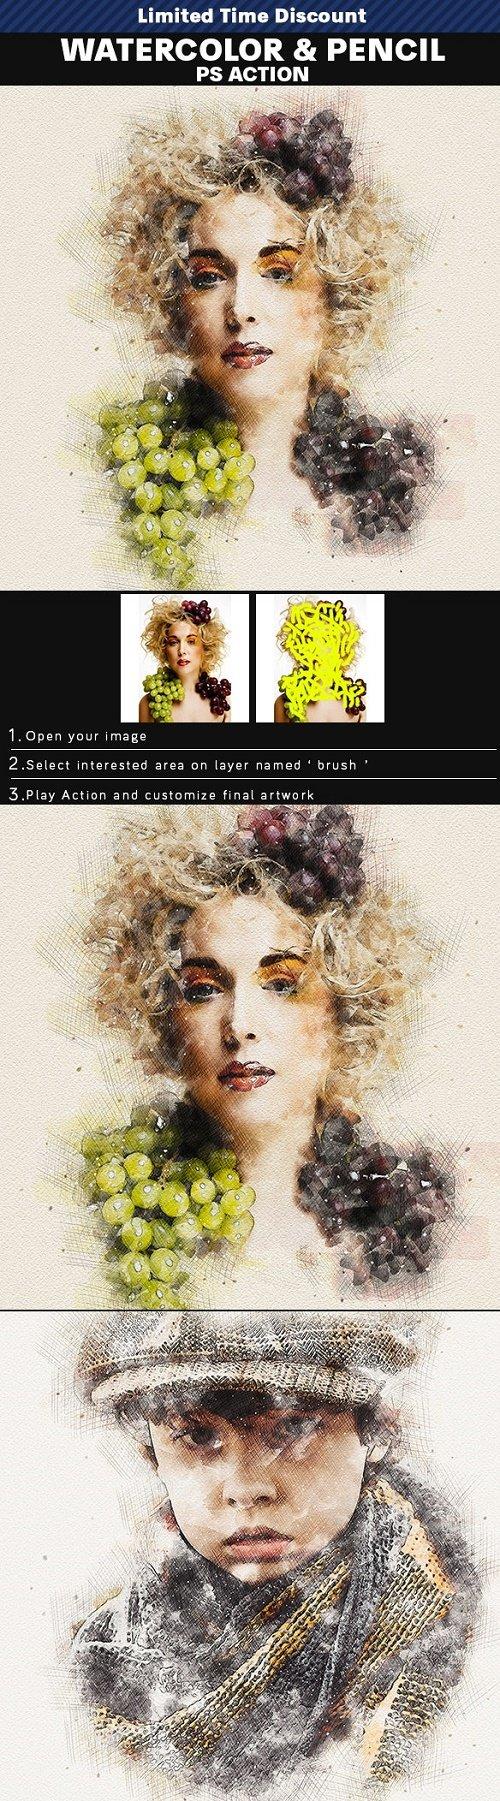 Watercolor & Pencil PHSP Action 25825237